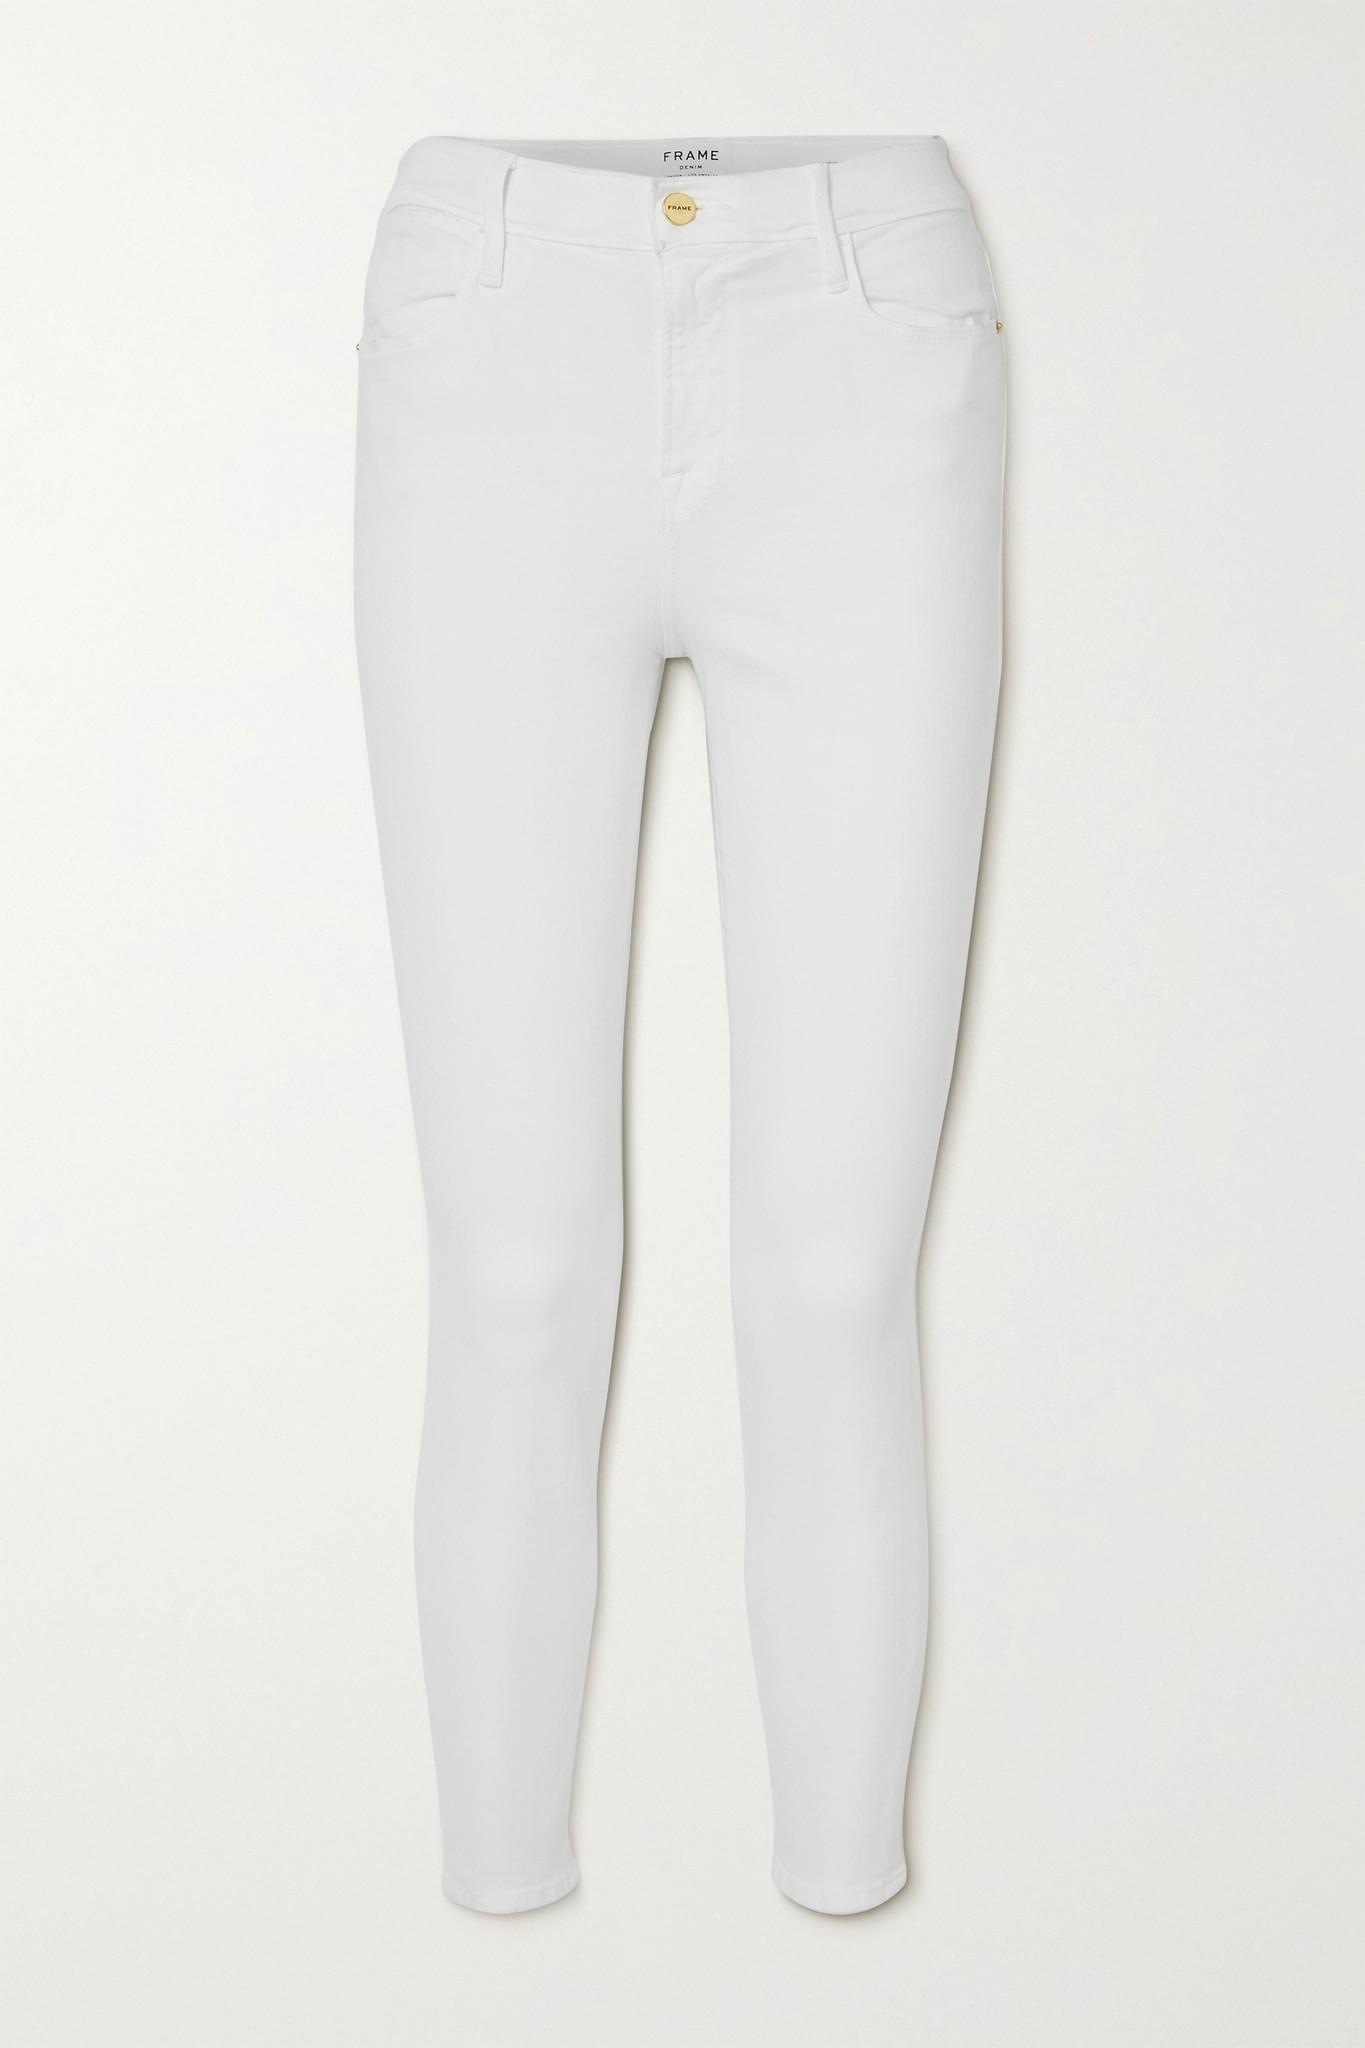 FRAME - Le High 磨边紧身牛仔裤 - 白色 - 30